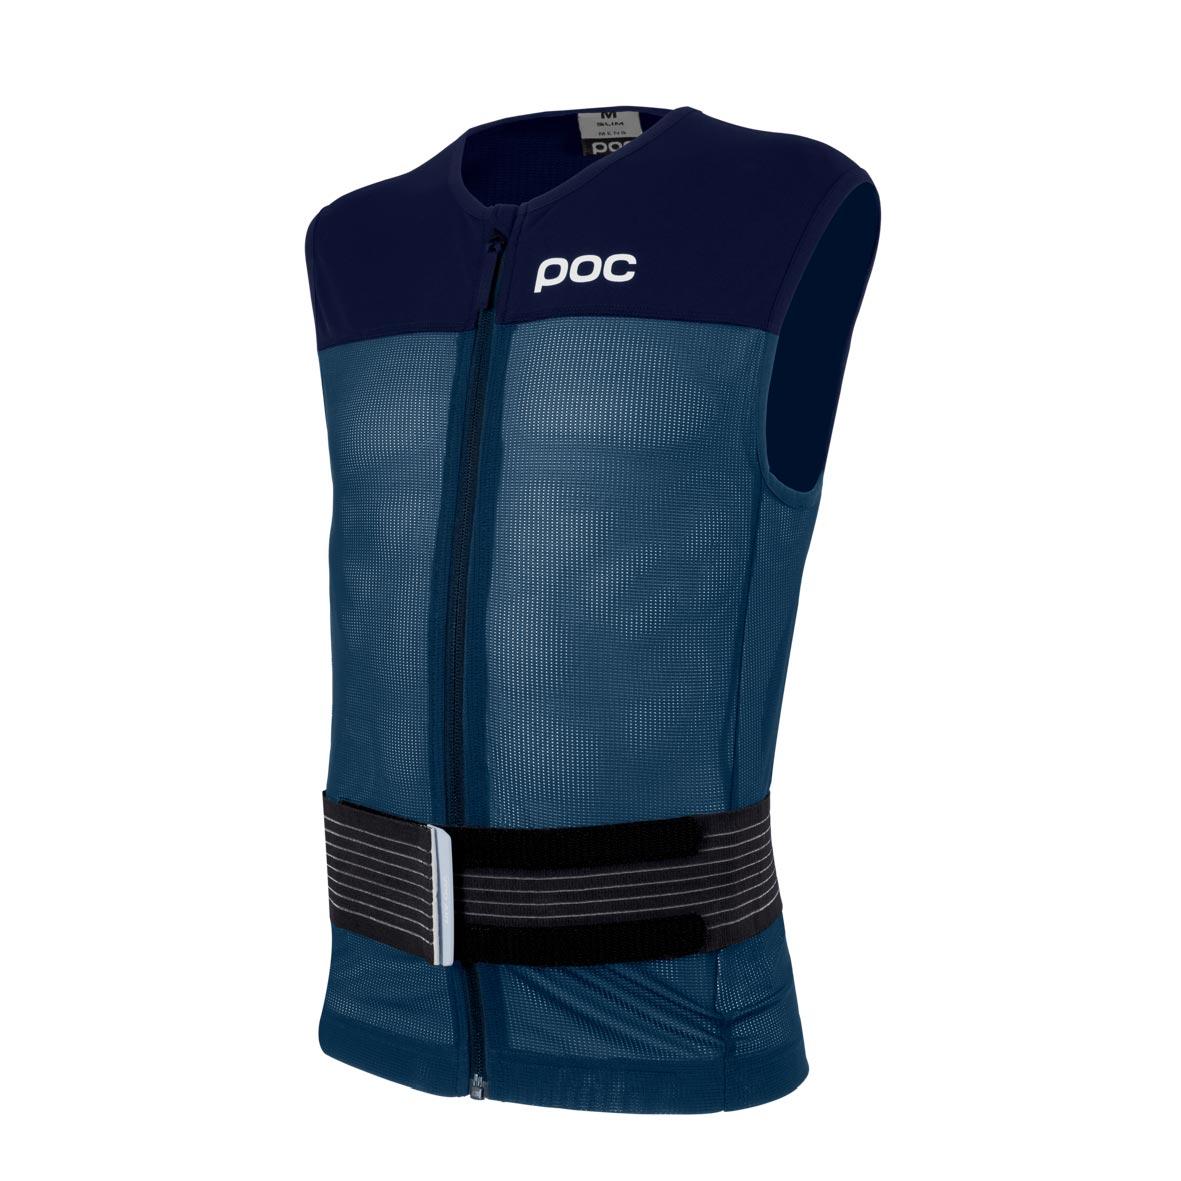 POC Spine VPD Air Vest 17/18